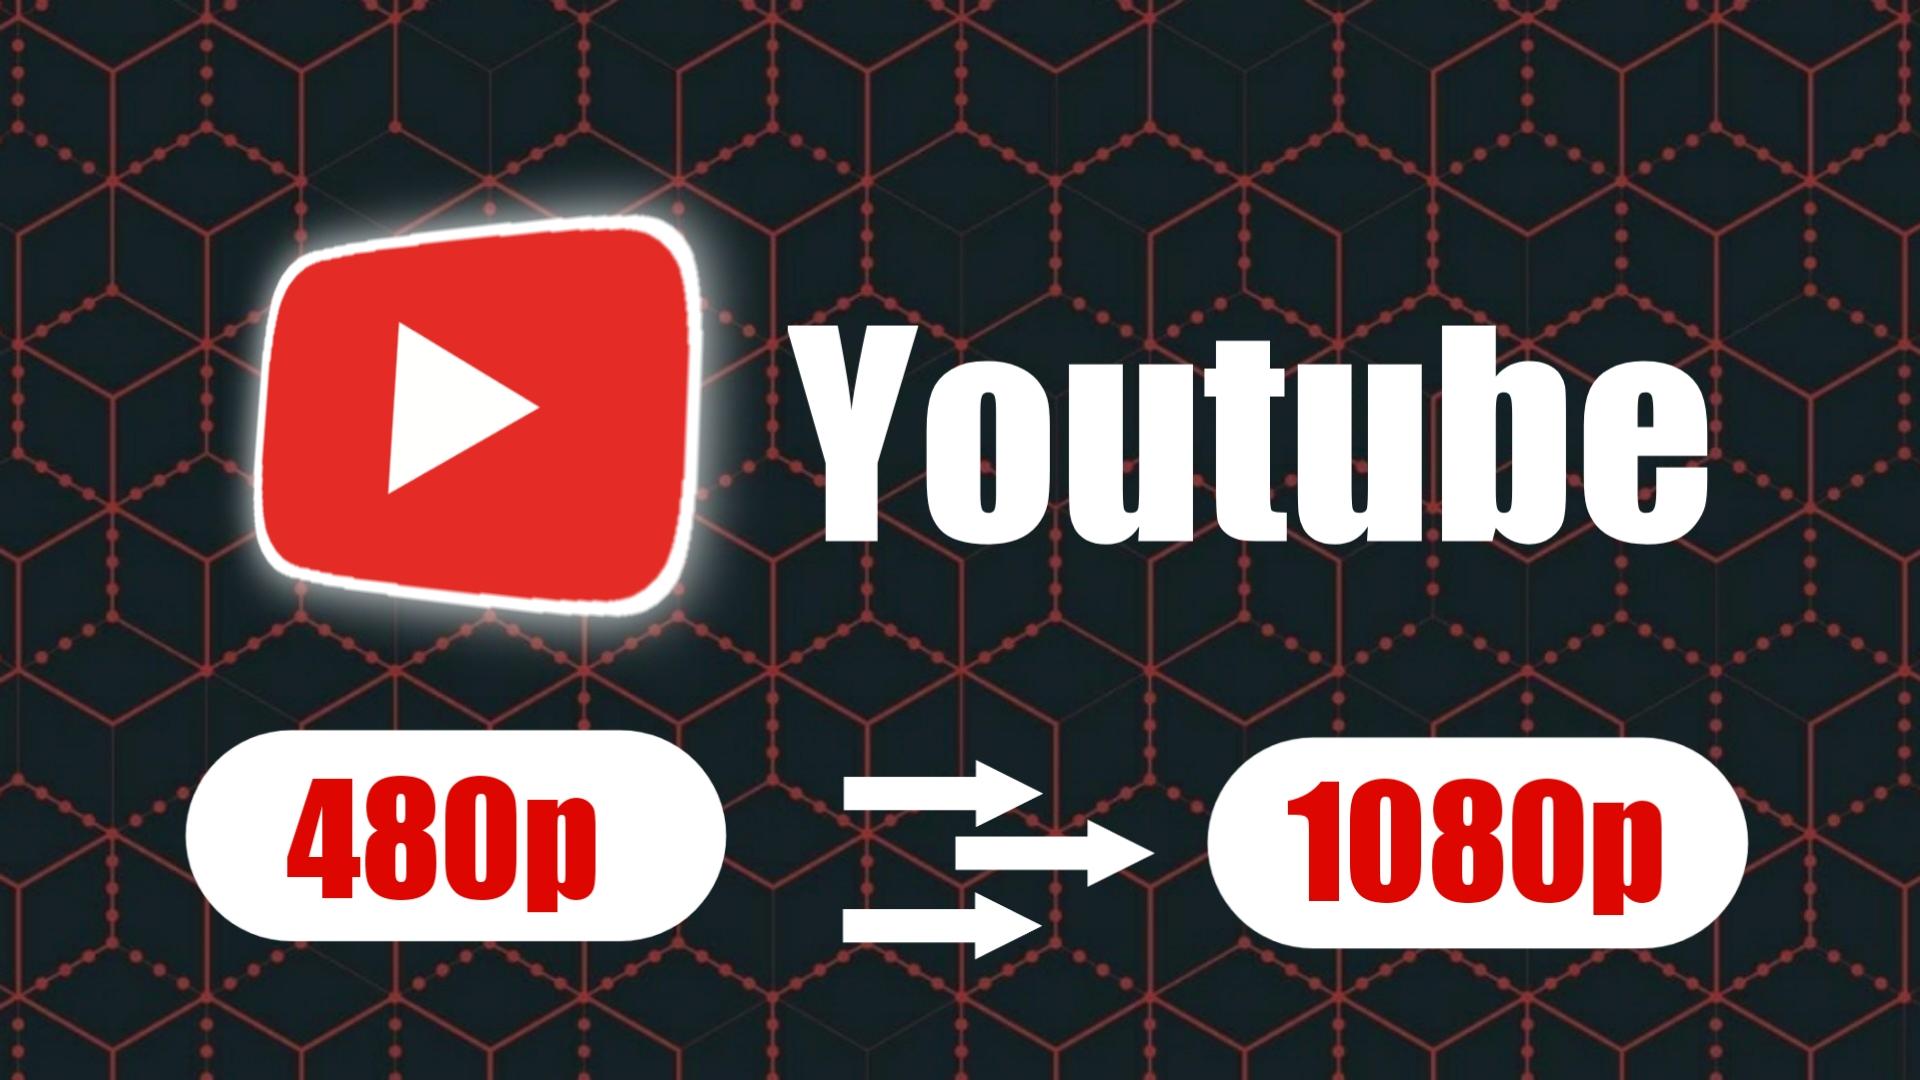 youtube hd streaming